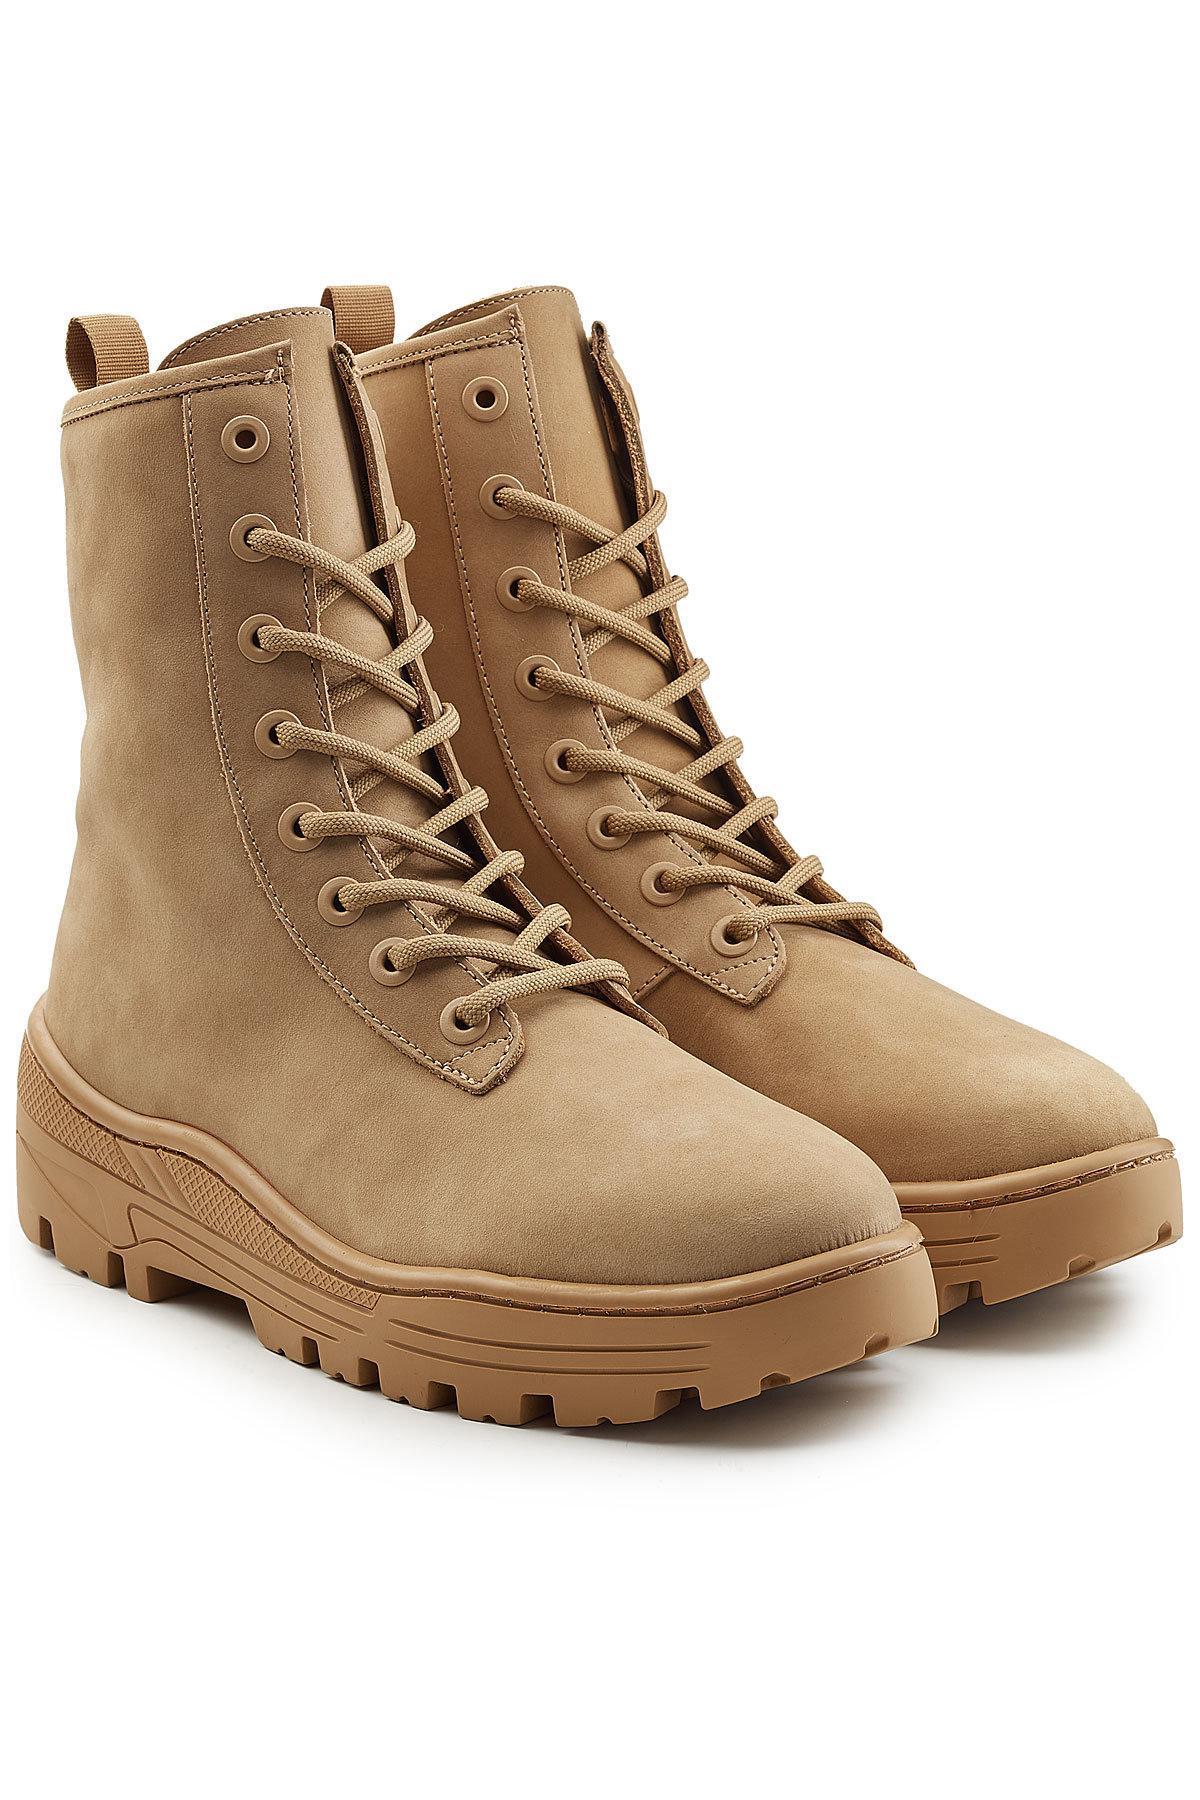 Giuseppe Zanotti Taupe Nubuck Military Boots